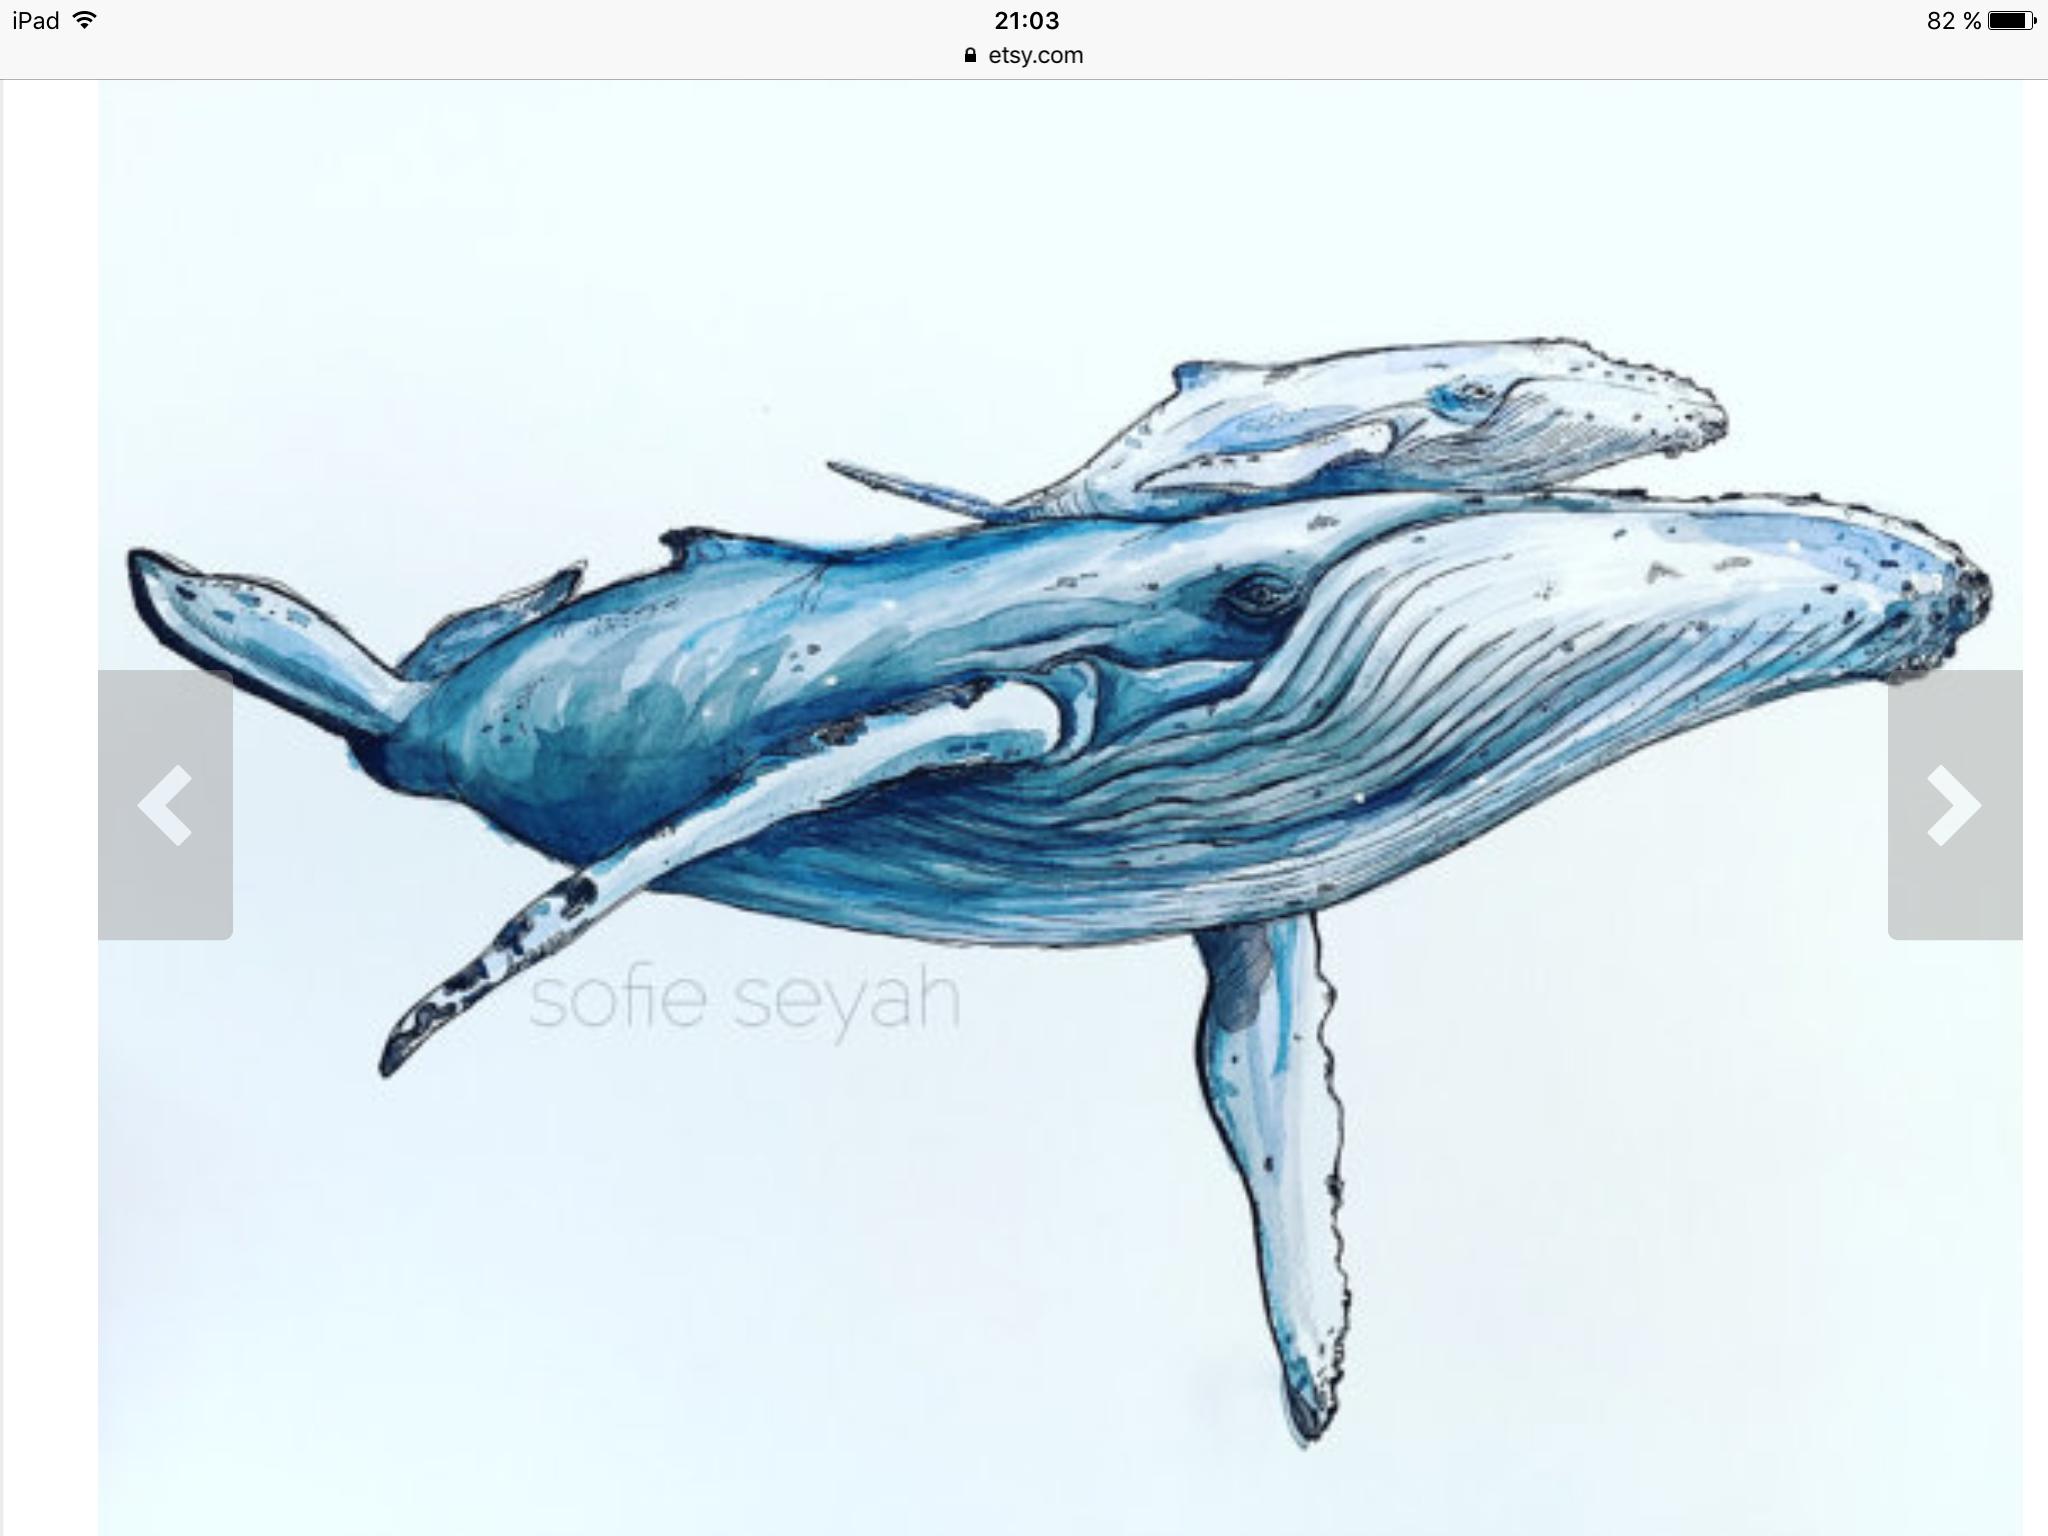 Pin de Ekaterina en Whaley   Pinterest   Ponerse, Coser y Animales